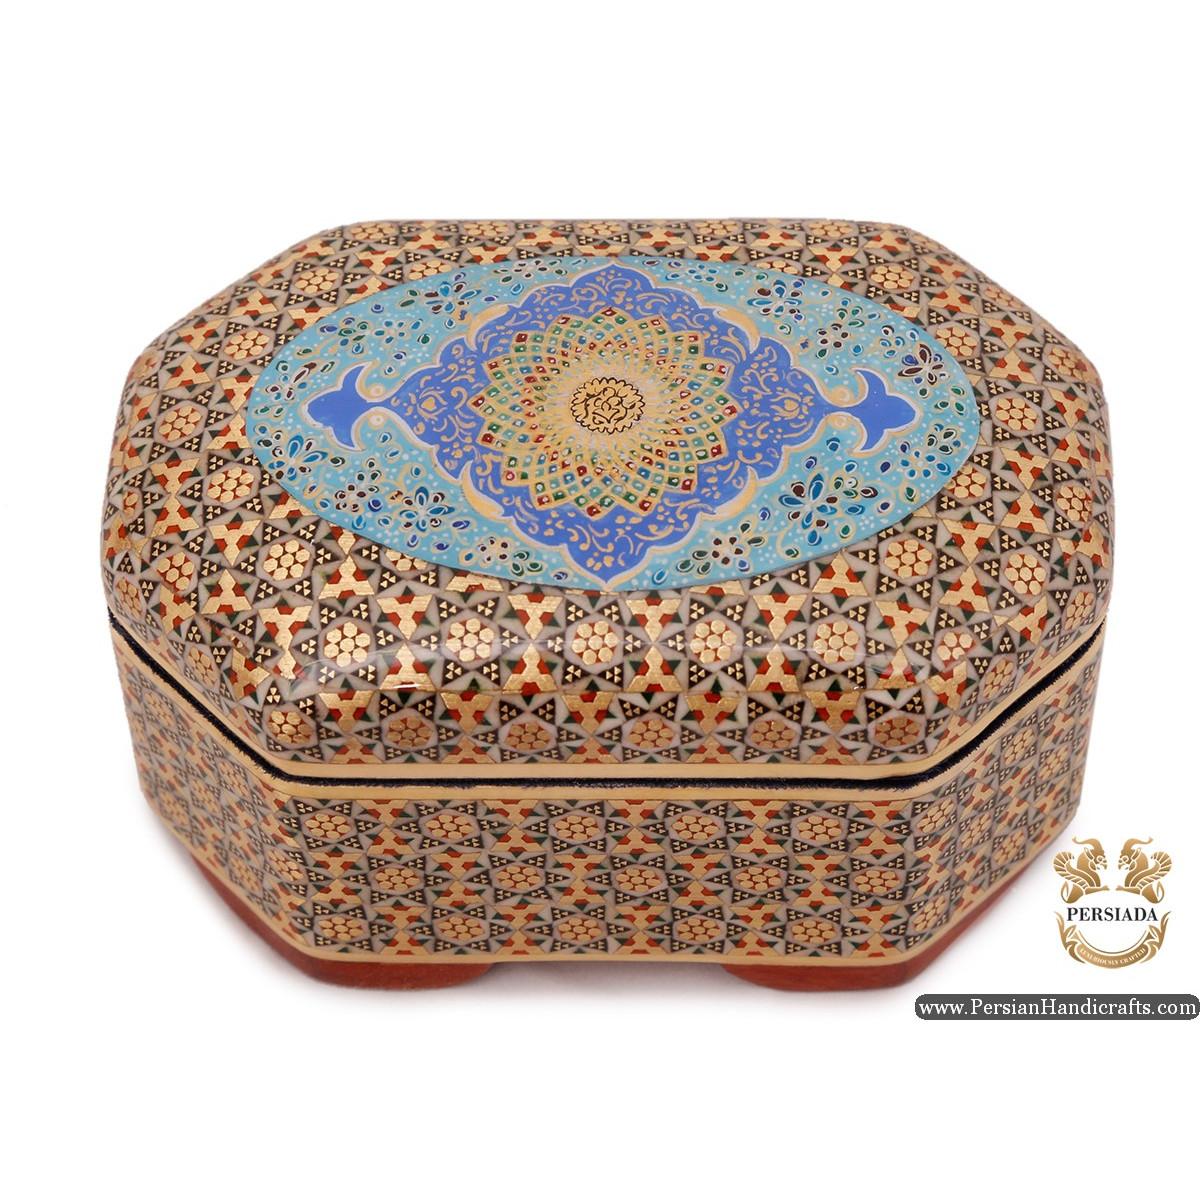 Jewellery Box   Miniature Khatam Marquetry   Persiada HKH6114